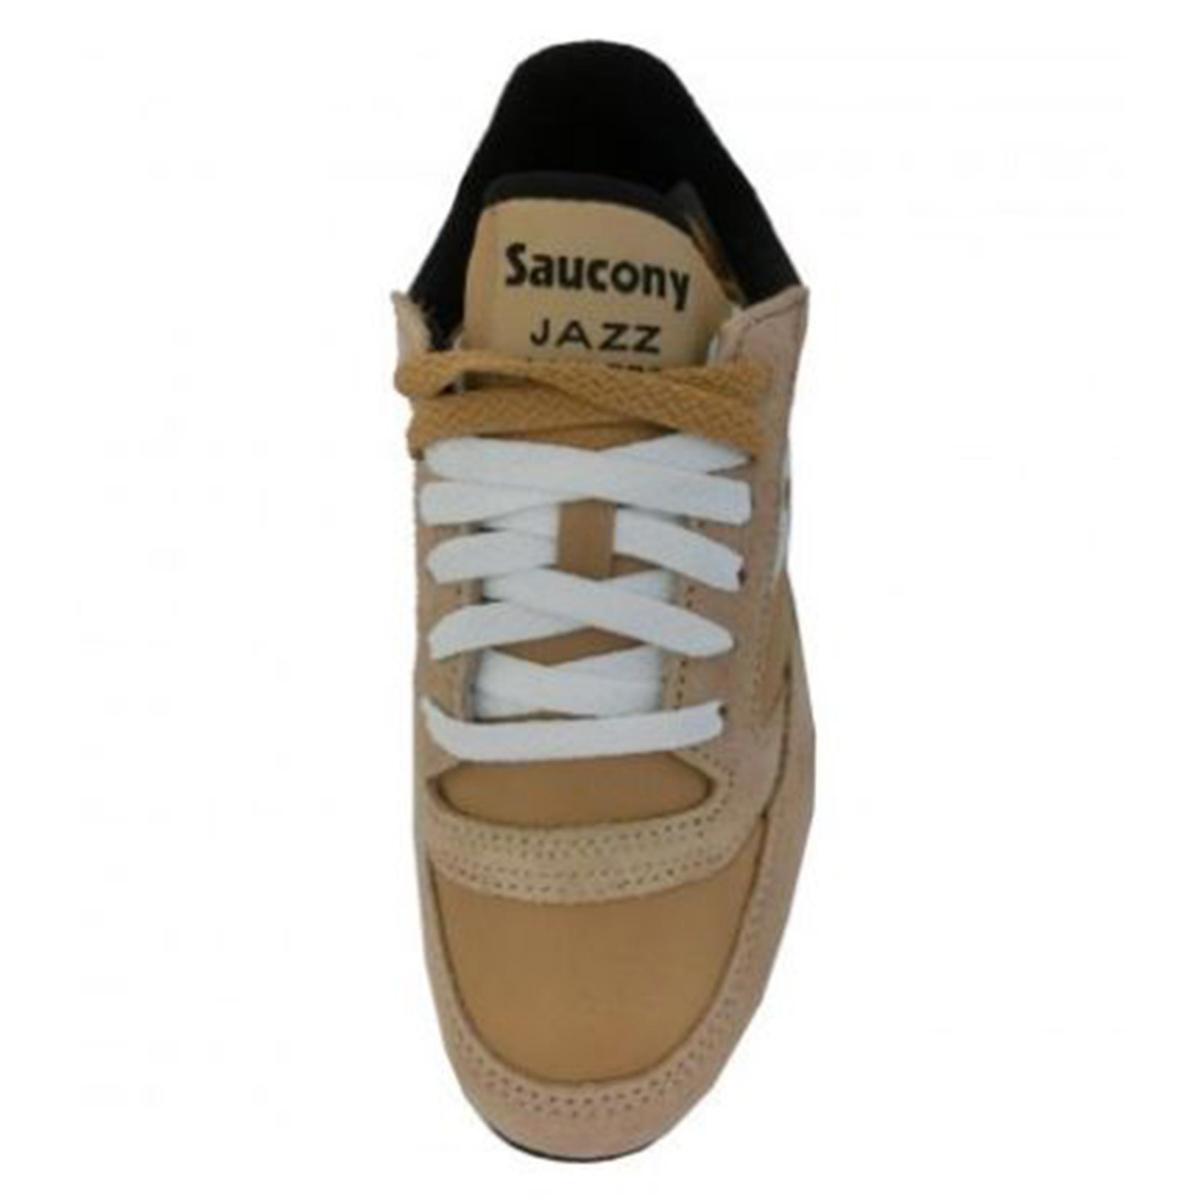 Scarpe Sneakers Saucony Jazz Low Pro Donna Rif. S1866-255